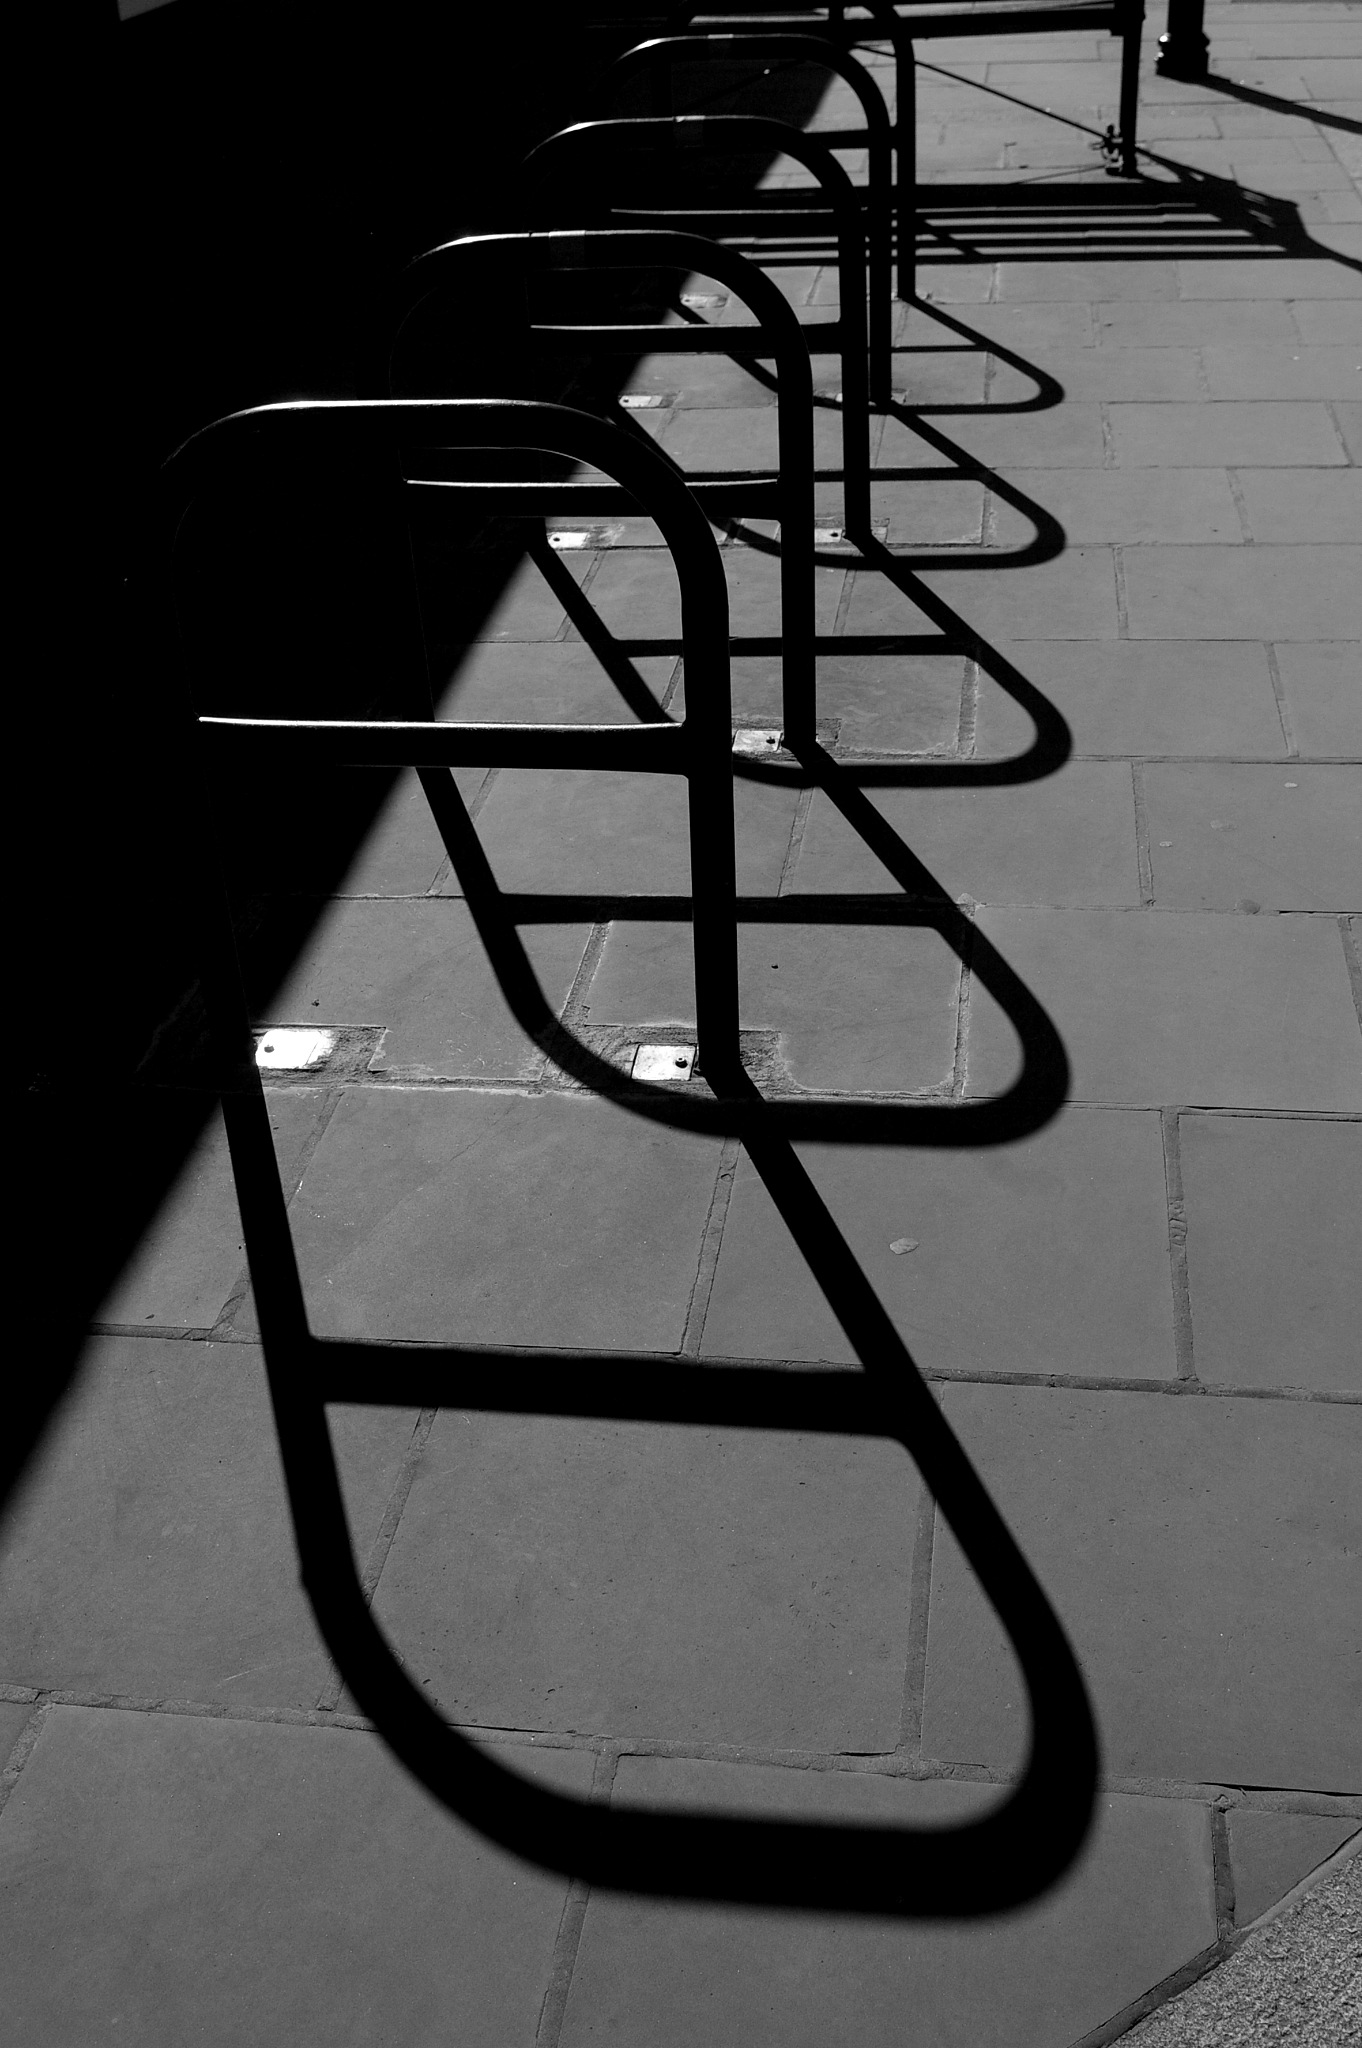 Untitled by Michael James De Grey